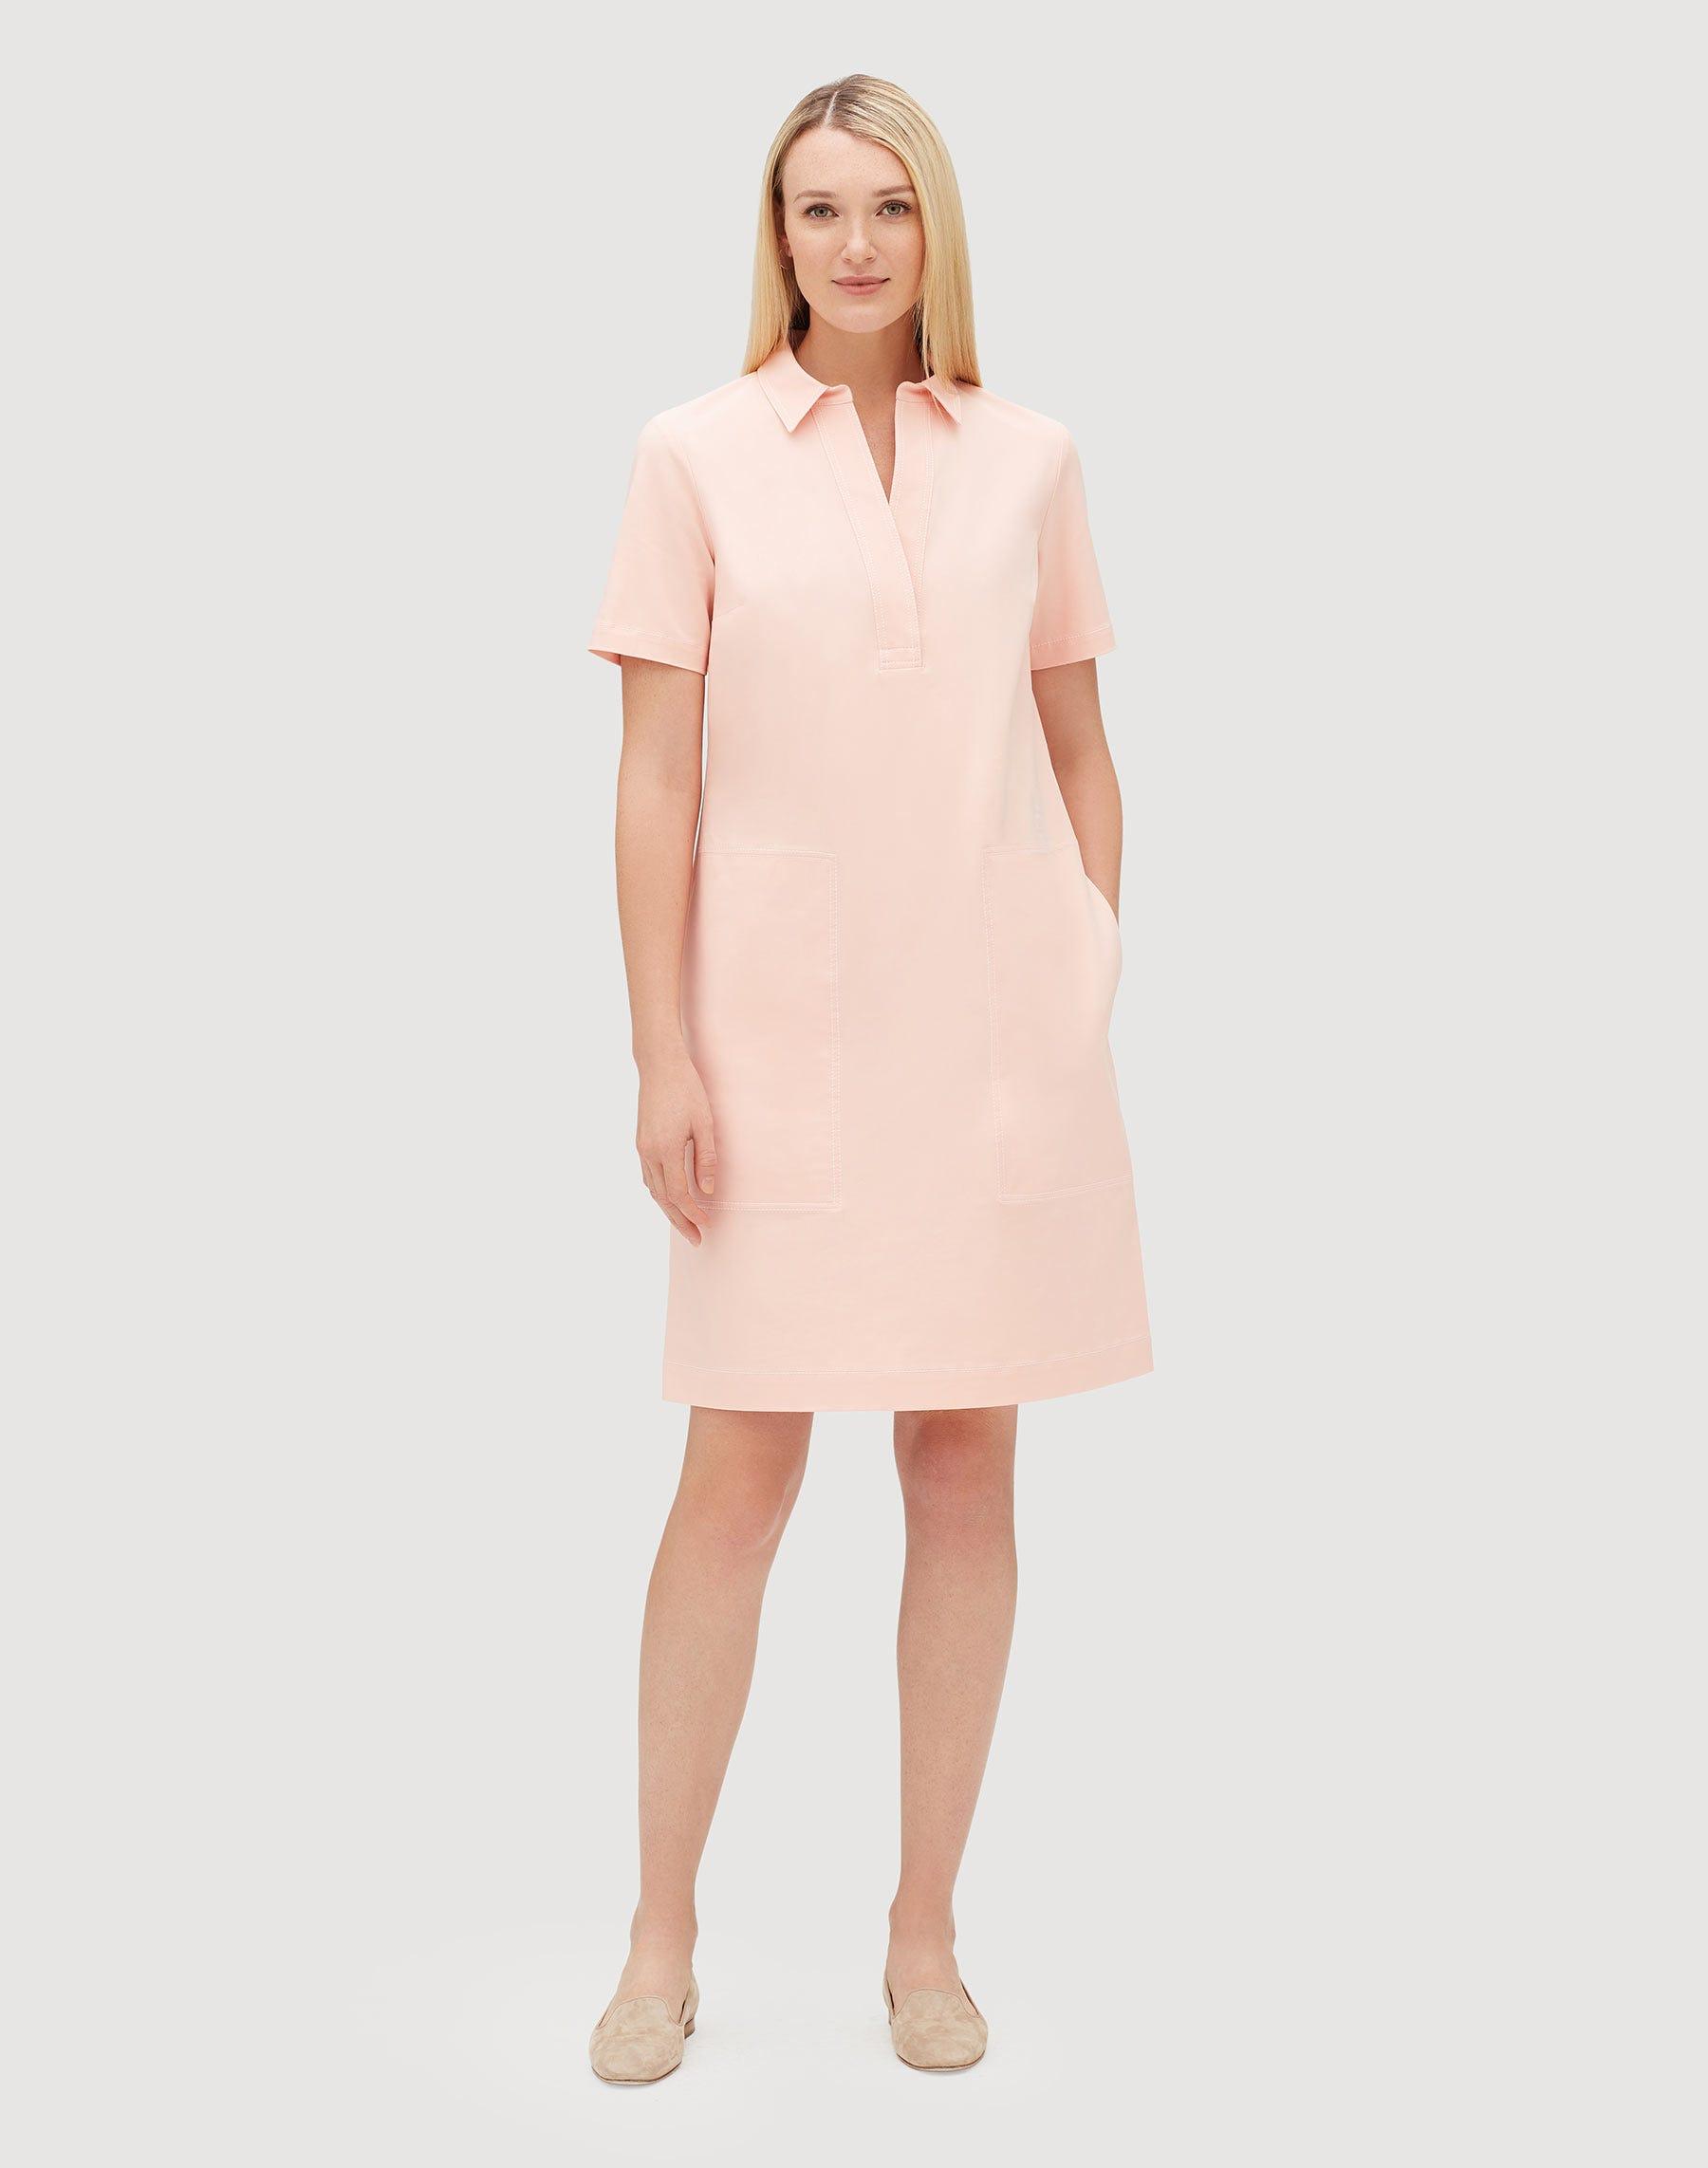 Plus-Size Fundamental Bi-Stretch Novella Dress   Lafayette 148 New York